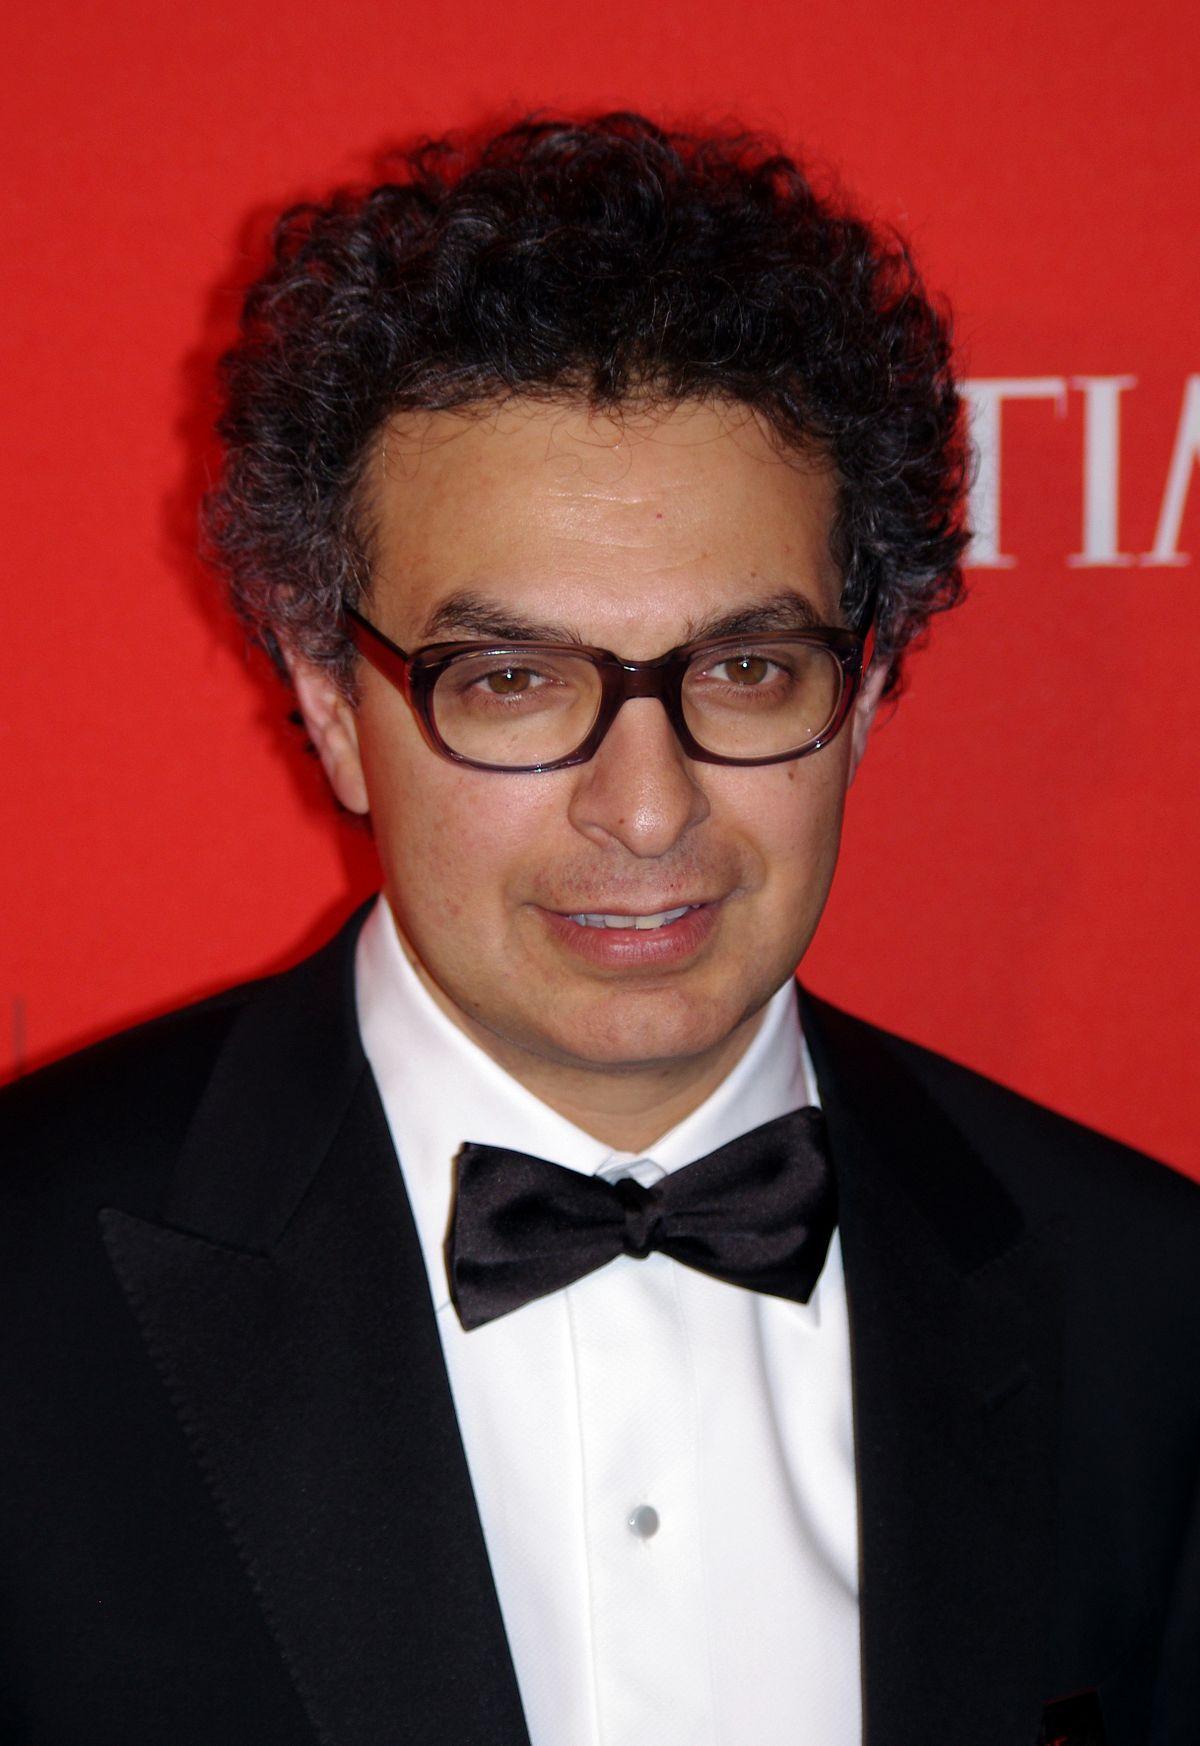 Saad Mohseni - Wikipedia